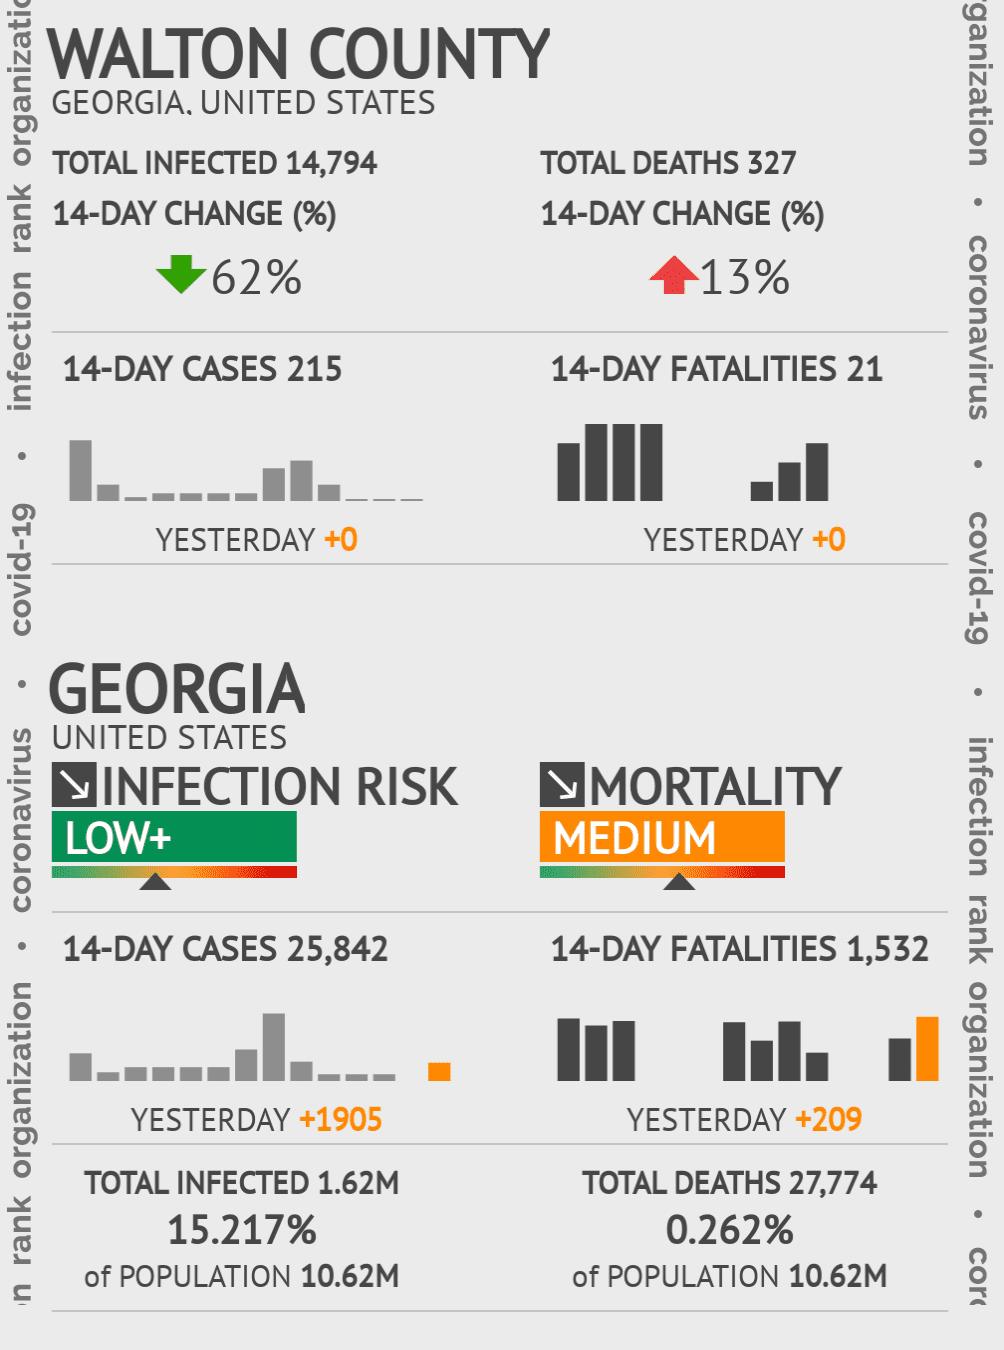 Walton County Coronavirus Covid-19 Risk of Infection on March 23, 2021